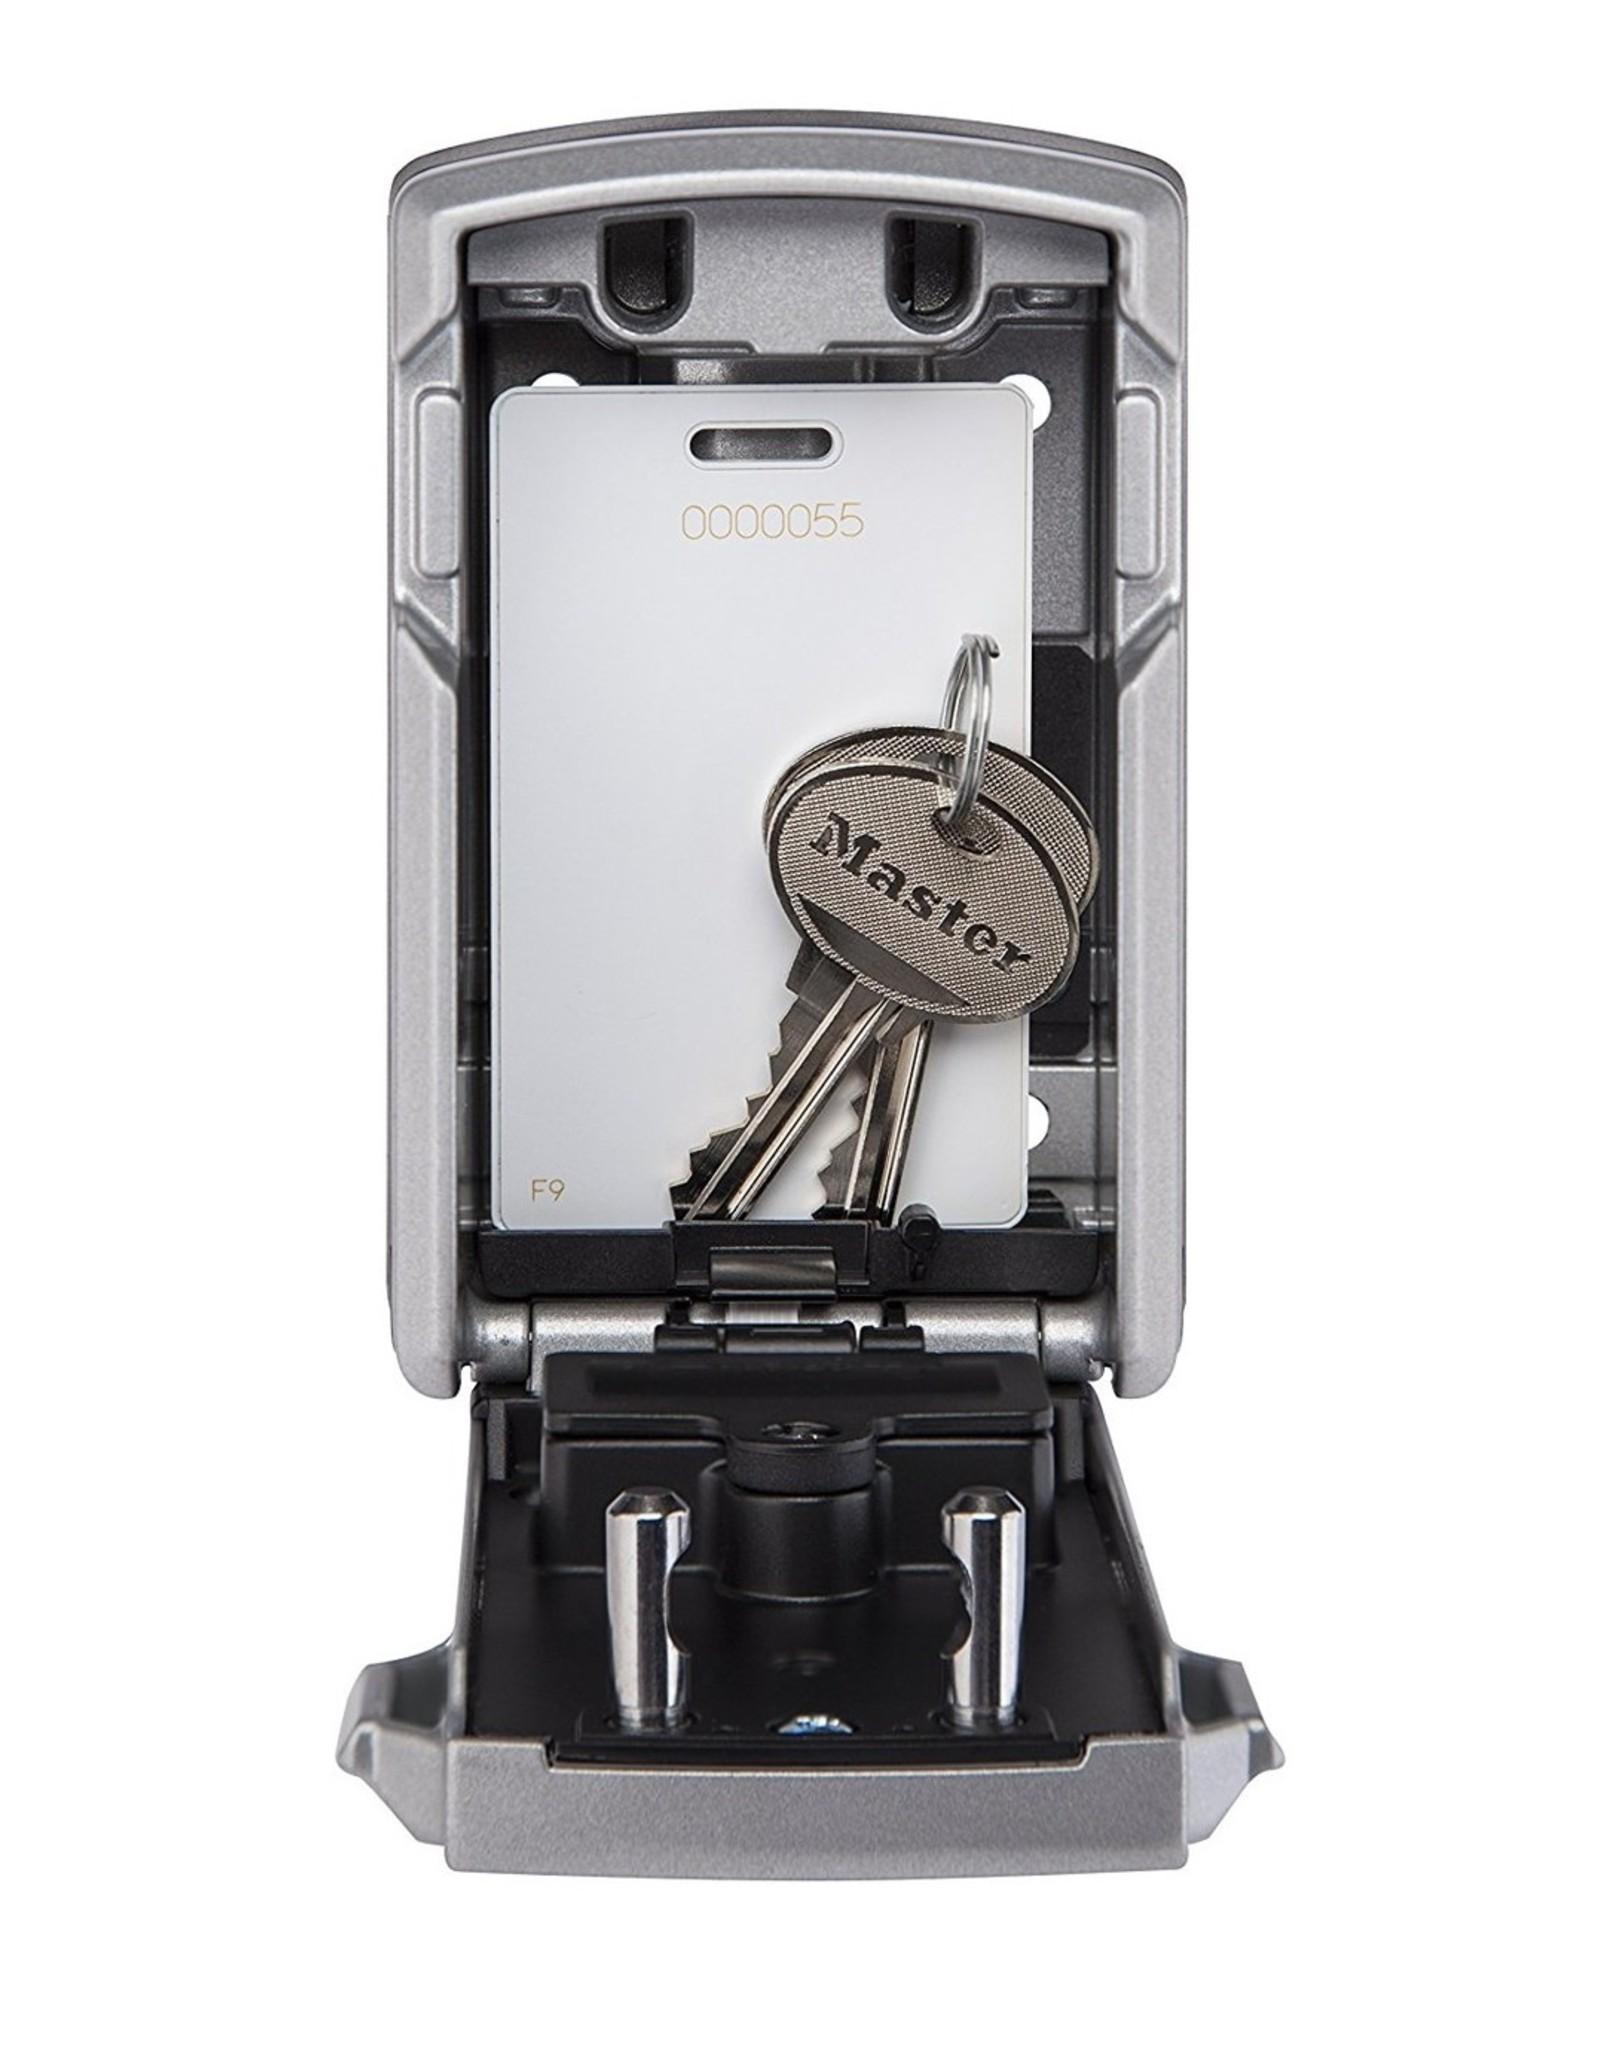 MasterLock MasterLock - Select Access Smart® - Bluetooth Sleutelkluis - Centraal opbergen van sleutels